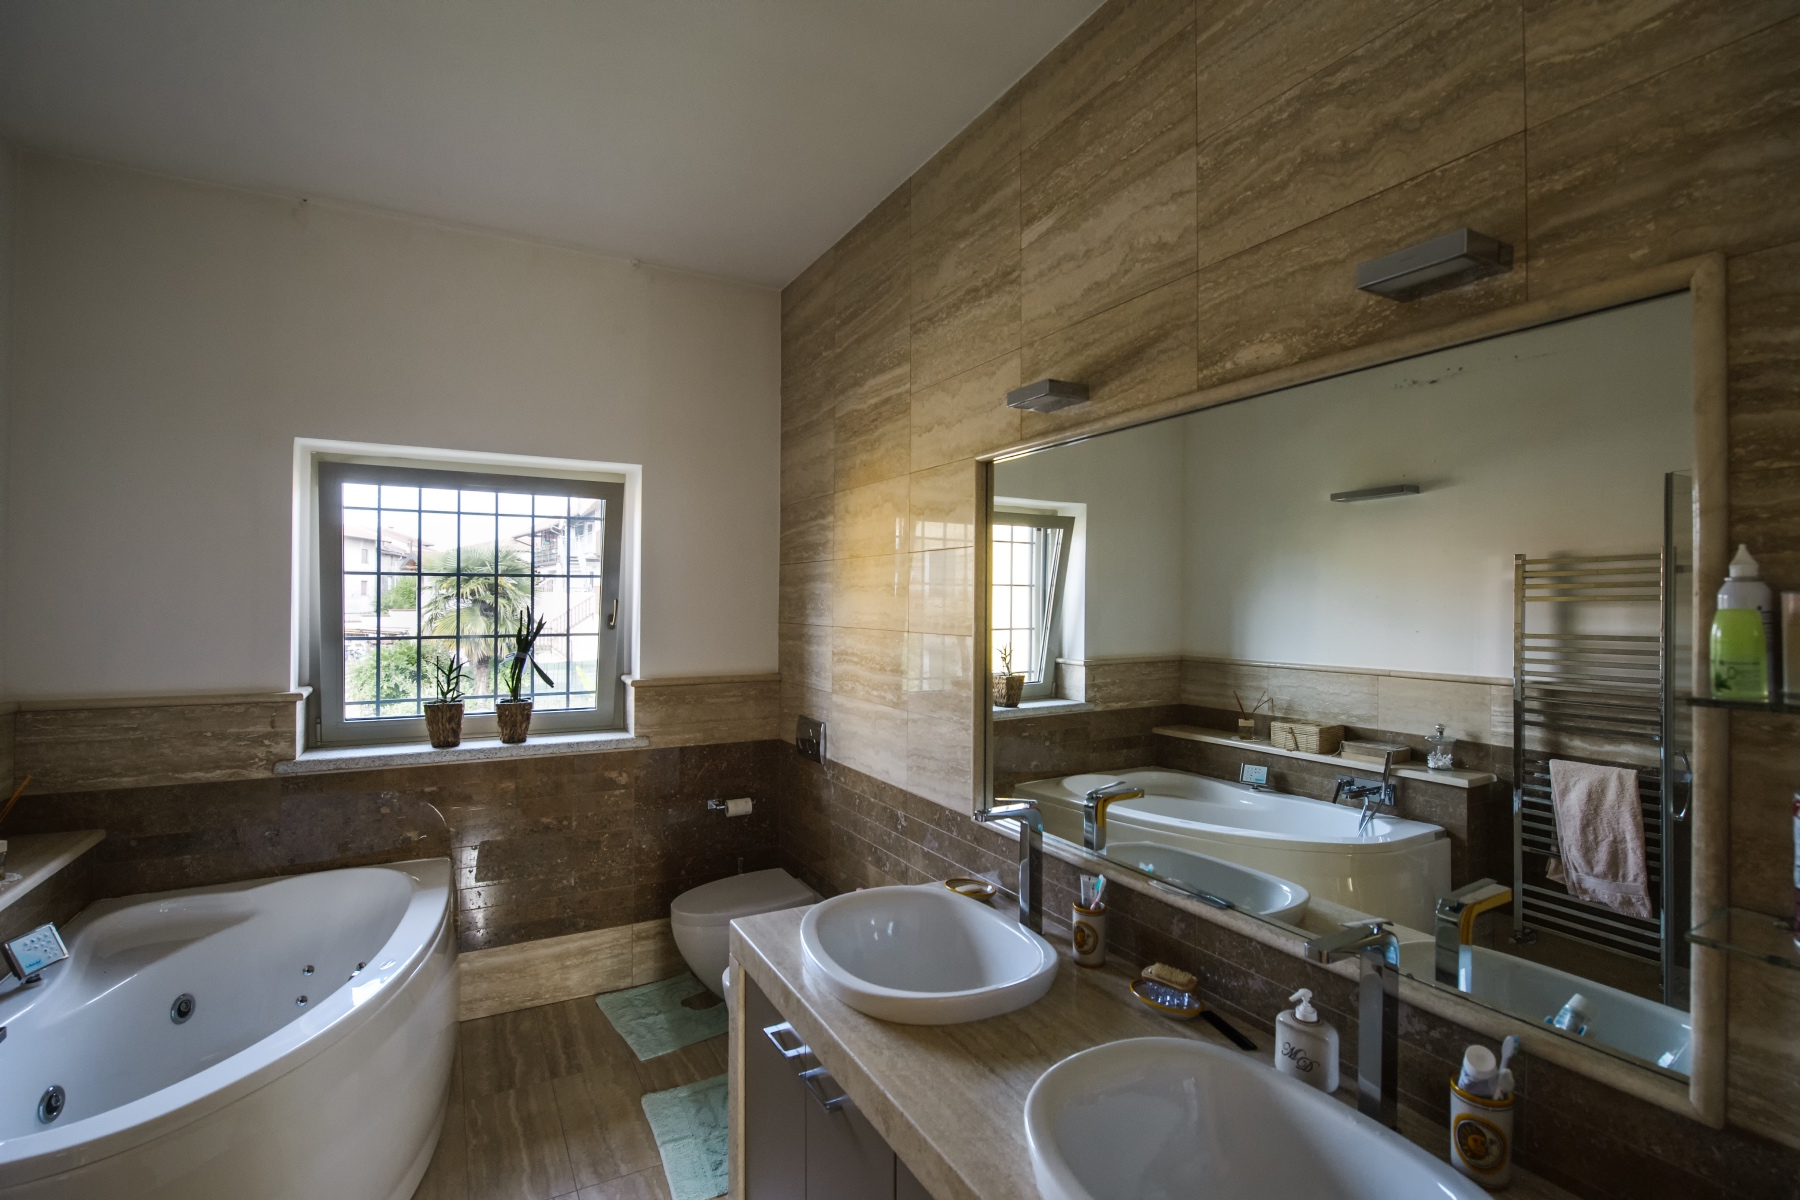 Casa indipendente in Vendita a Agrate Conturbia: 5 locali, 400 mq - Foto 13